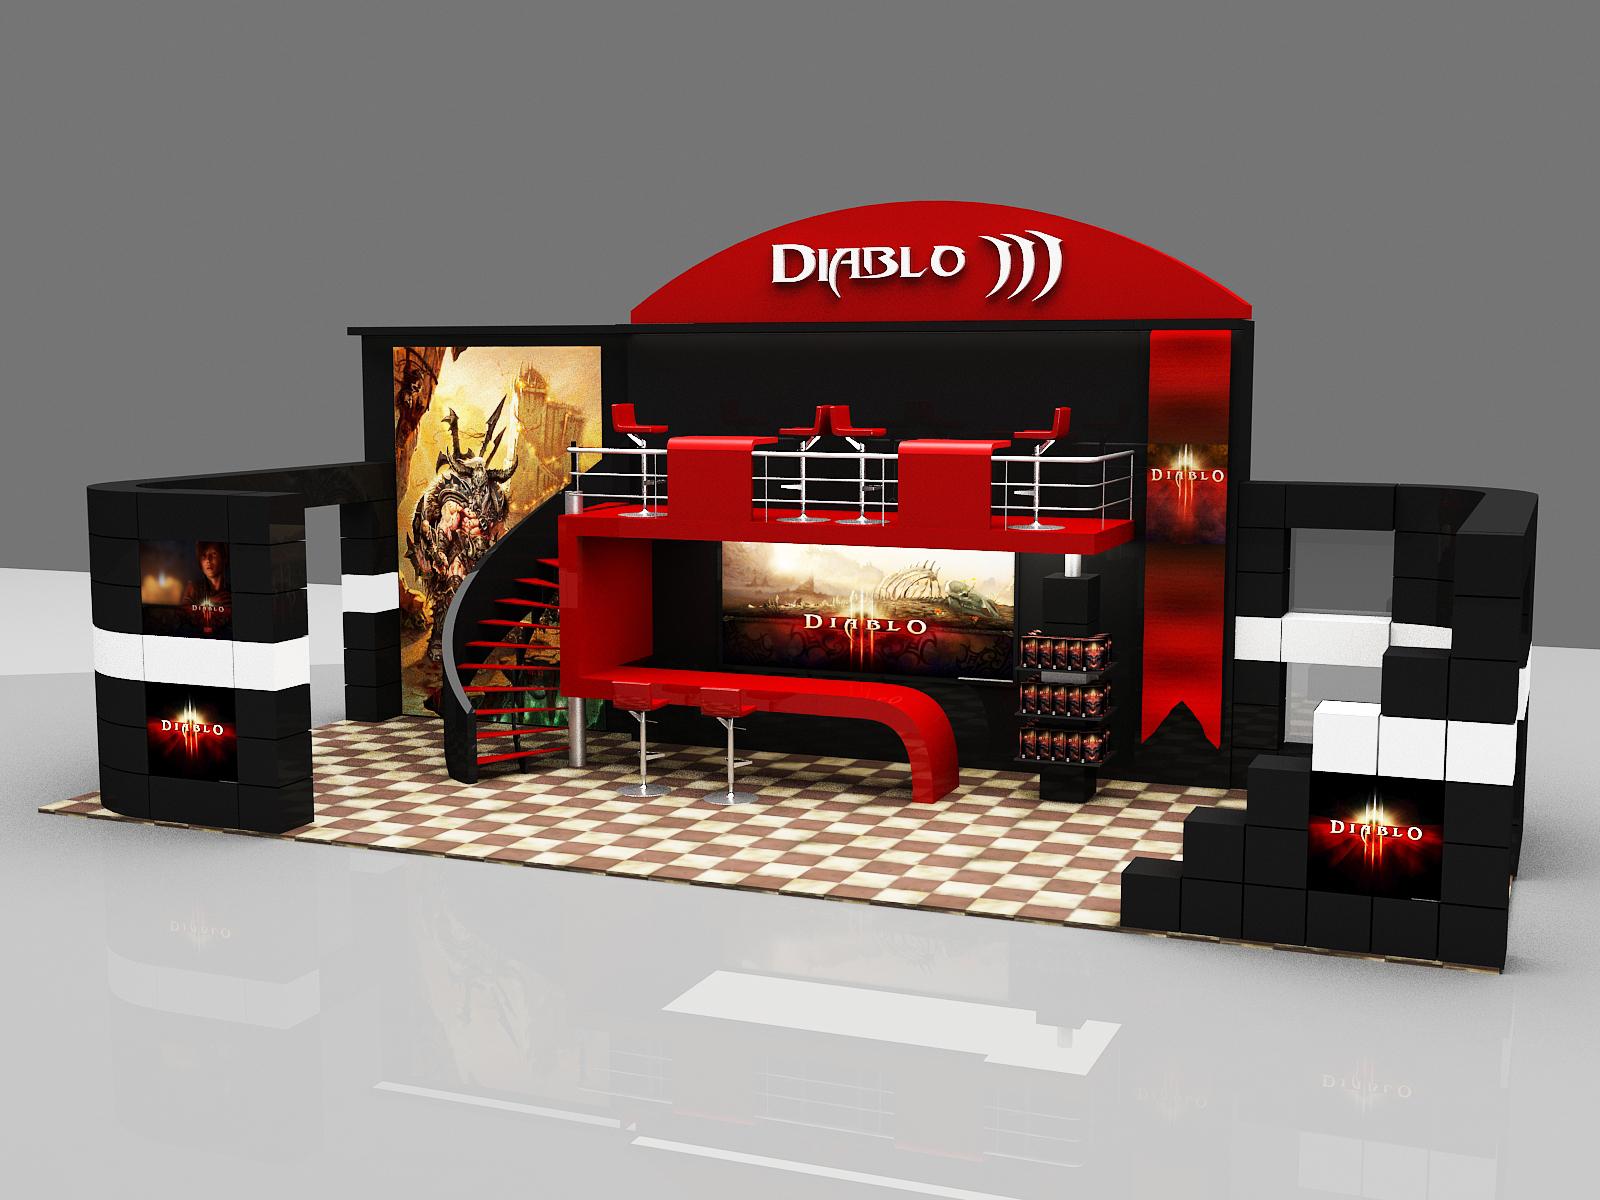 Diablo iii fair stand design by imperatore34 on deviantart - Design fair ...